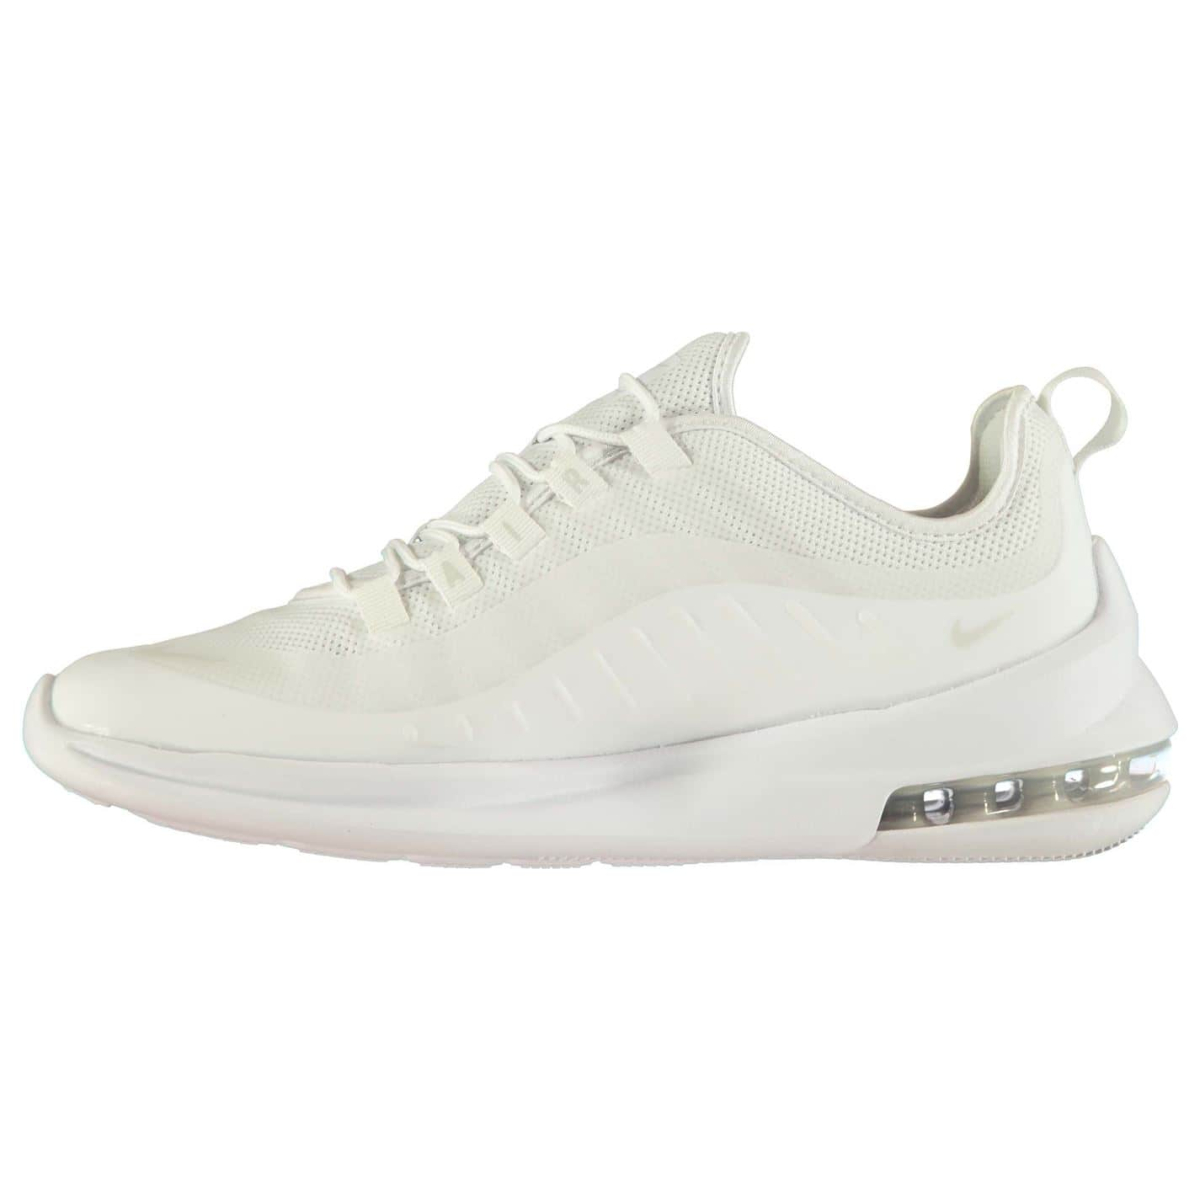 NIKE-Air-Max-Axis-Scarpe-da-ginnastica-Scarpe-da-Corsa-Uomo-Sneaker-Scarpe-Sportive-Fitness-1313 miniatura 40